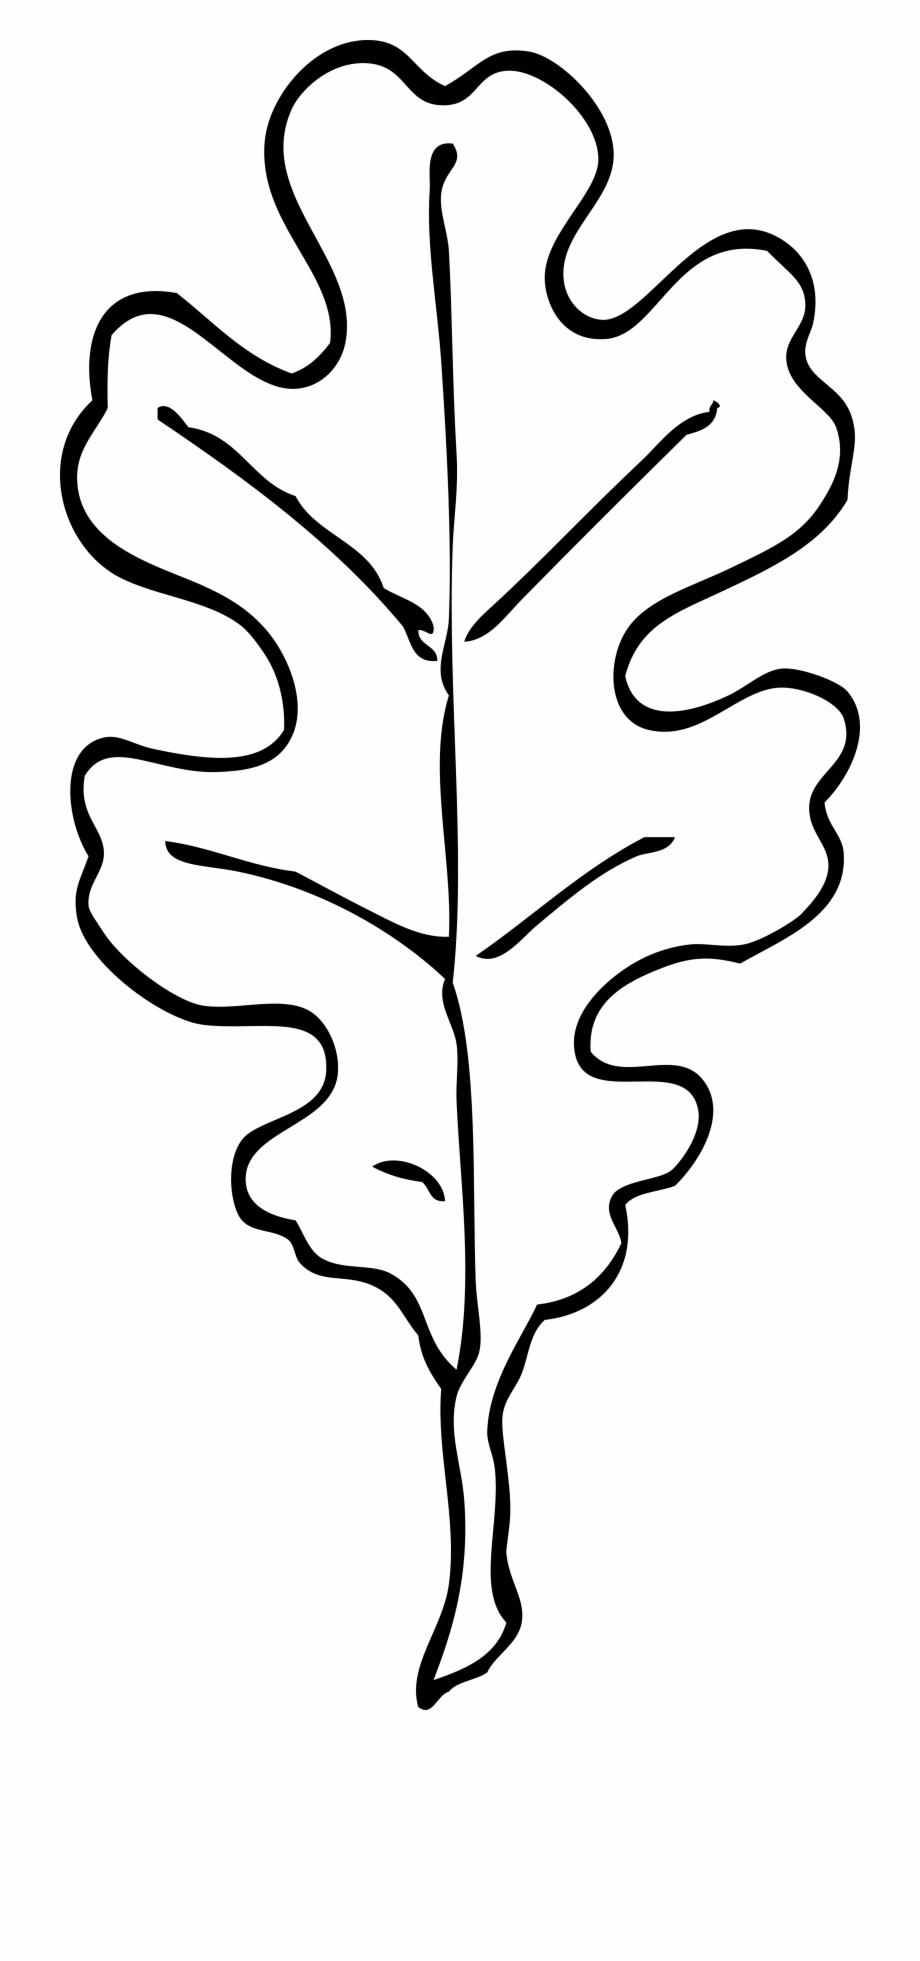 Autumn oak leaf black and white clipart freeuse library Fall Leaves Clipart Black And White Border - Oak Leaf Clipart Black ... freeuse library